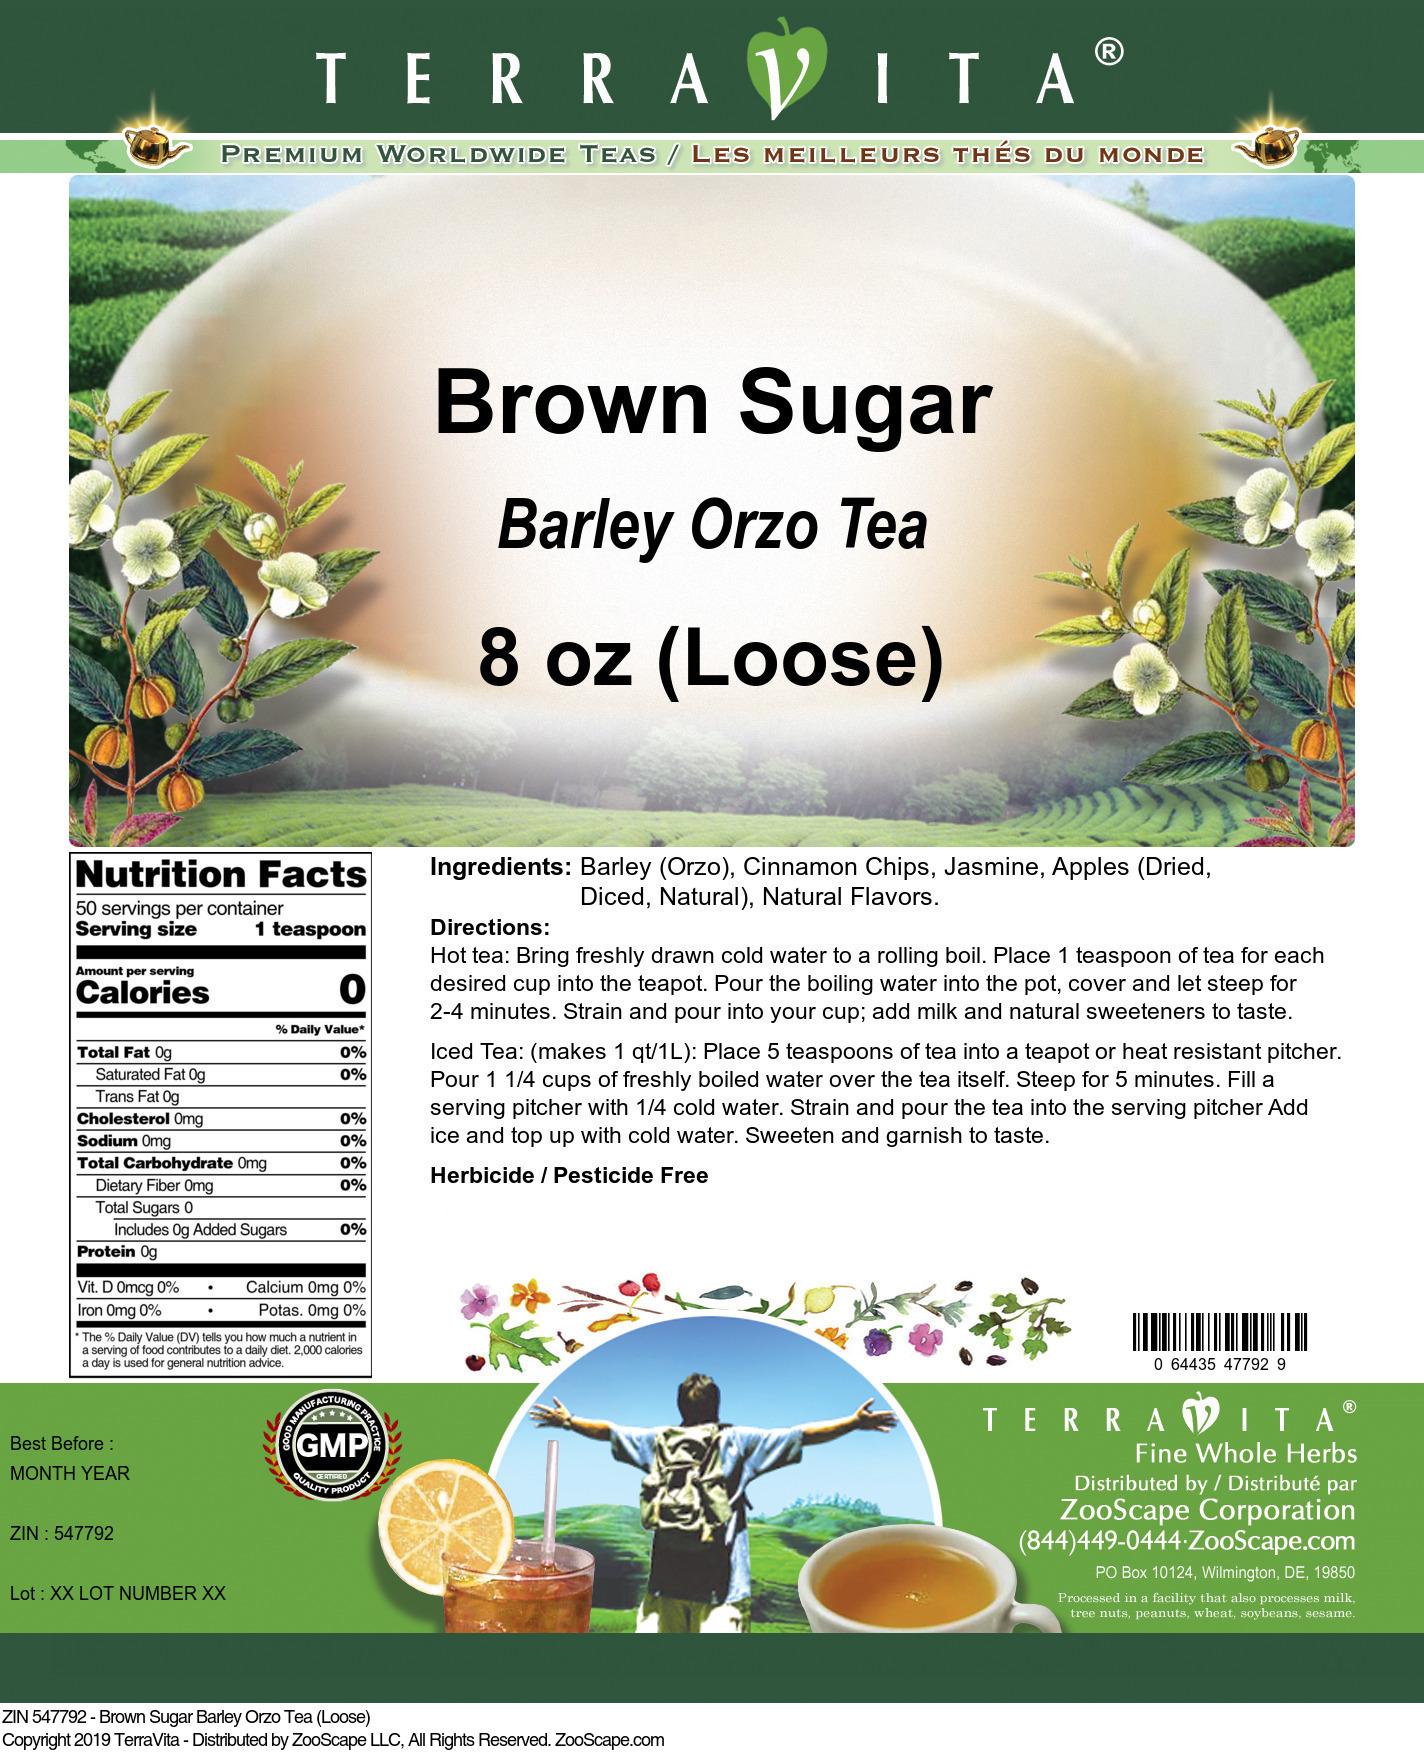 Brown Sugar Barley Orzo Tea (Loose)